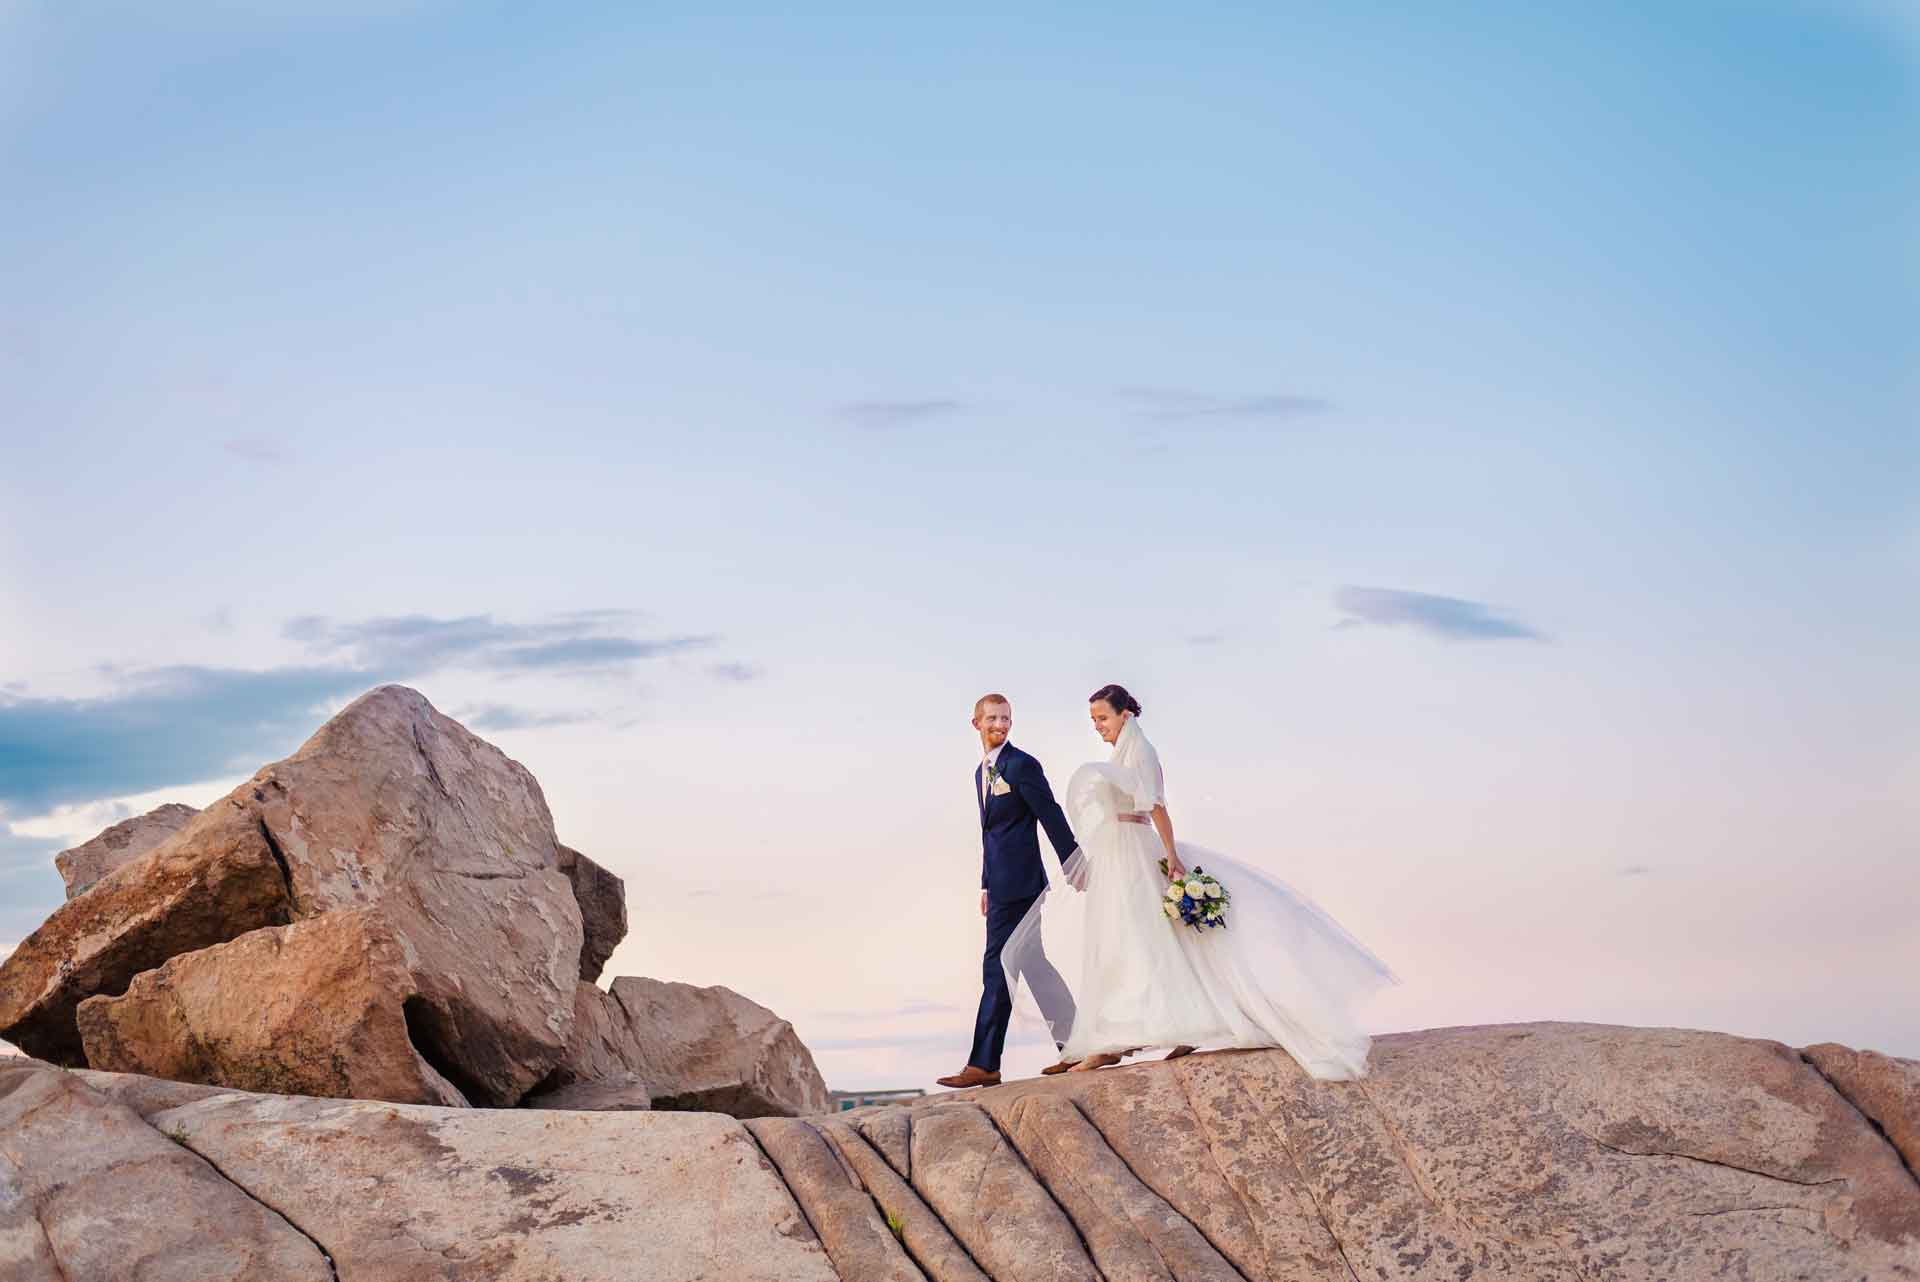 ocean side bride and grrom walking on large rocks at sunset